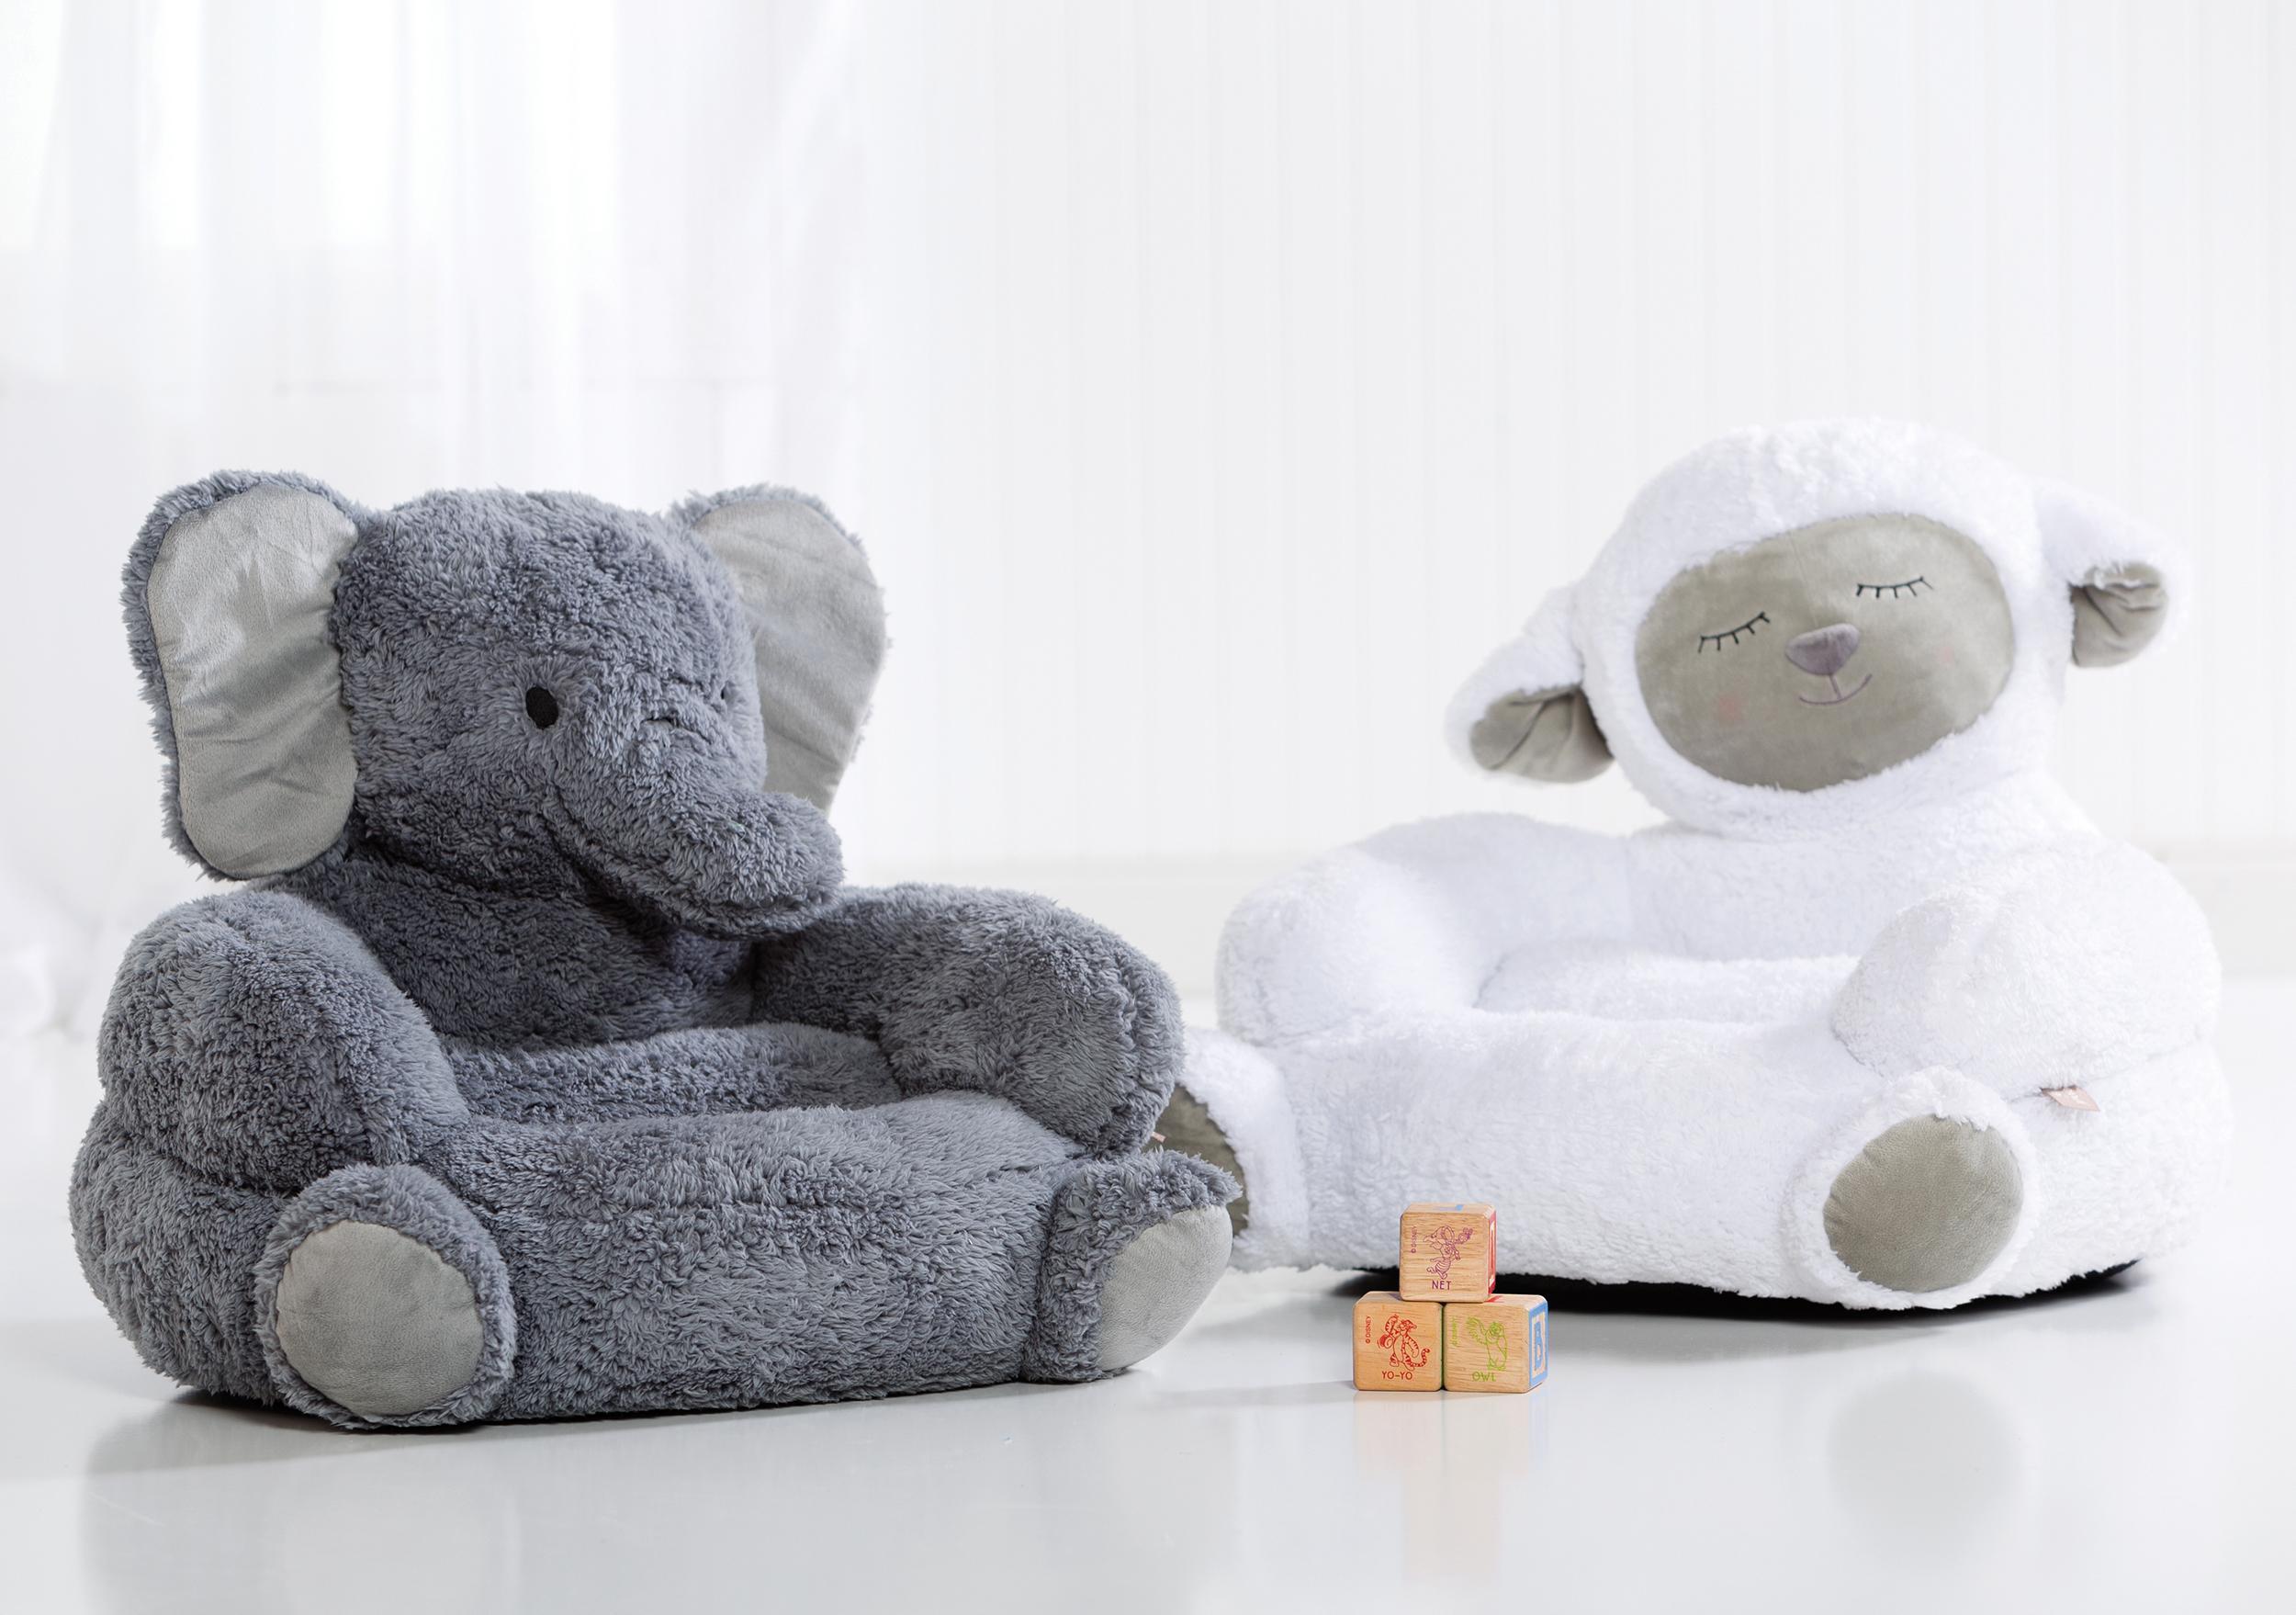 Elephant Chair, Lamb Chair, Character Chair, Plush Chair, Nursery Decor,  Gift